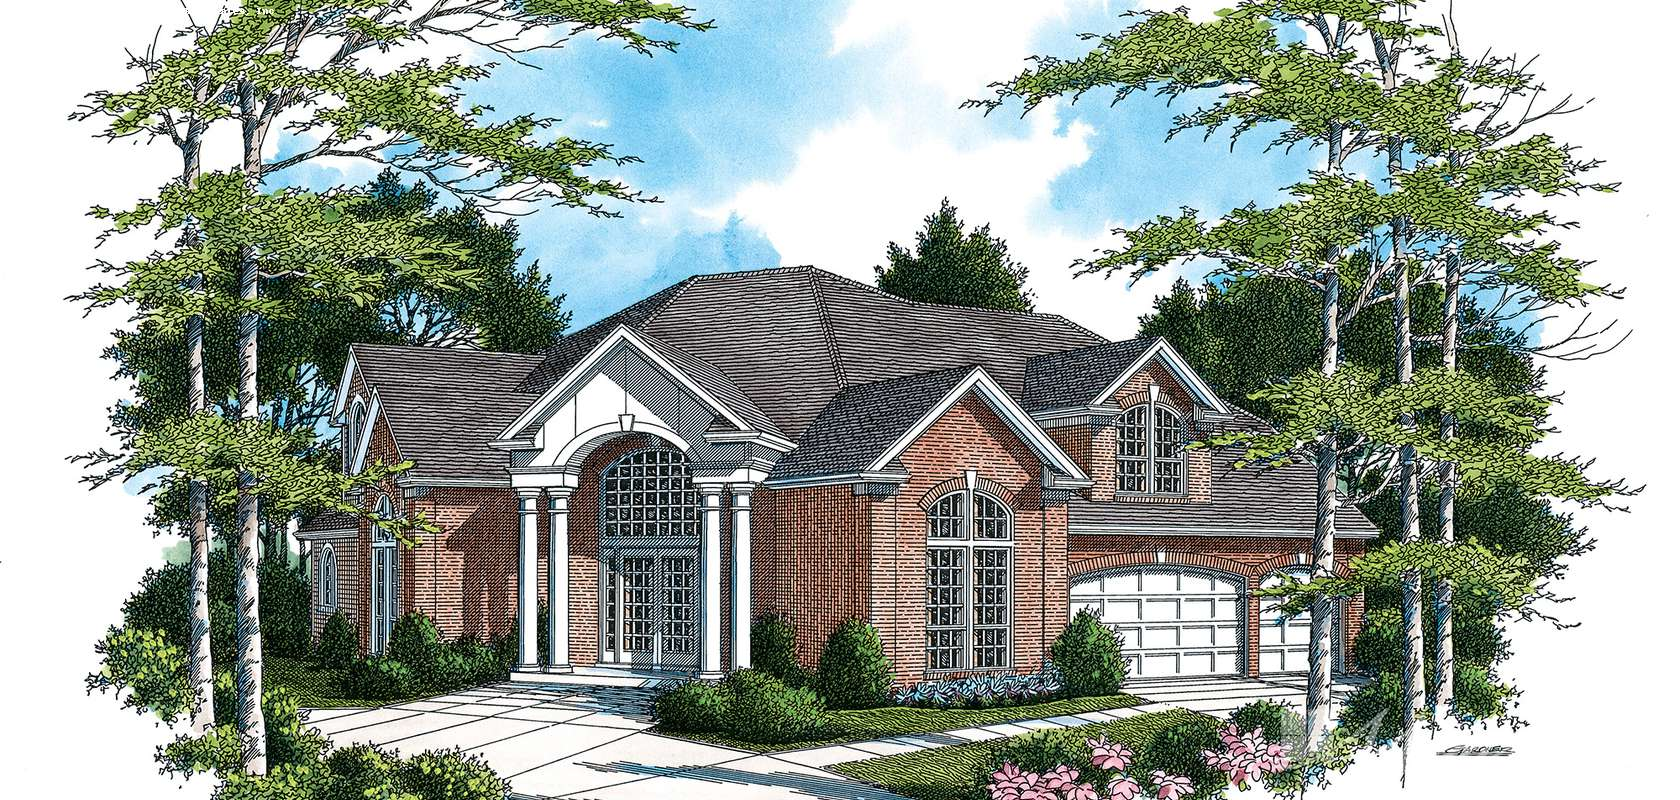 Mascord House Plan 2360: The Ingersoll